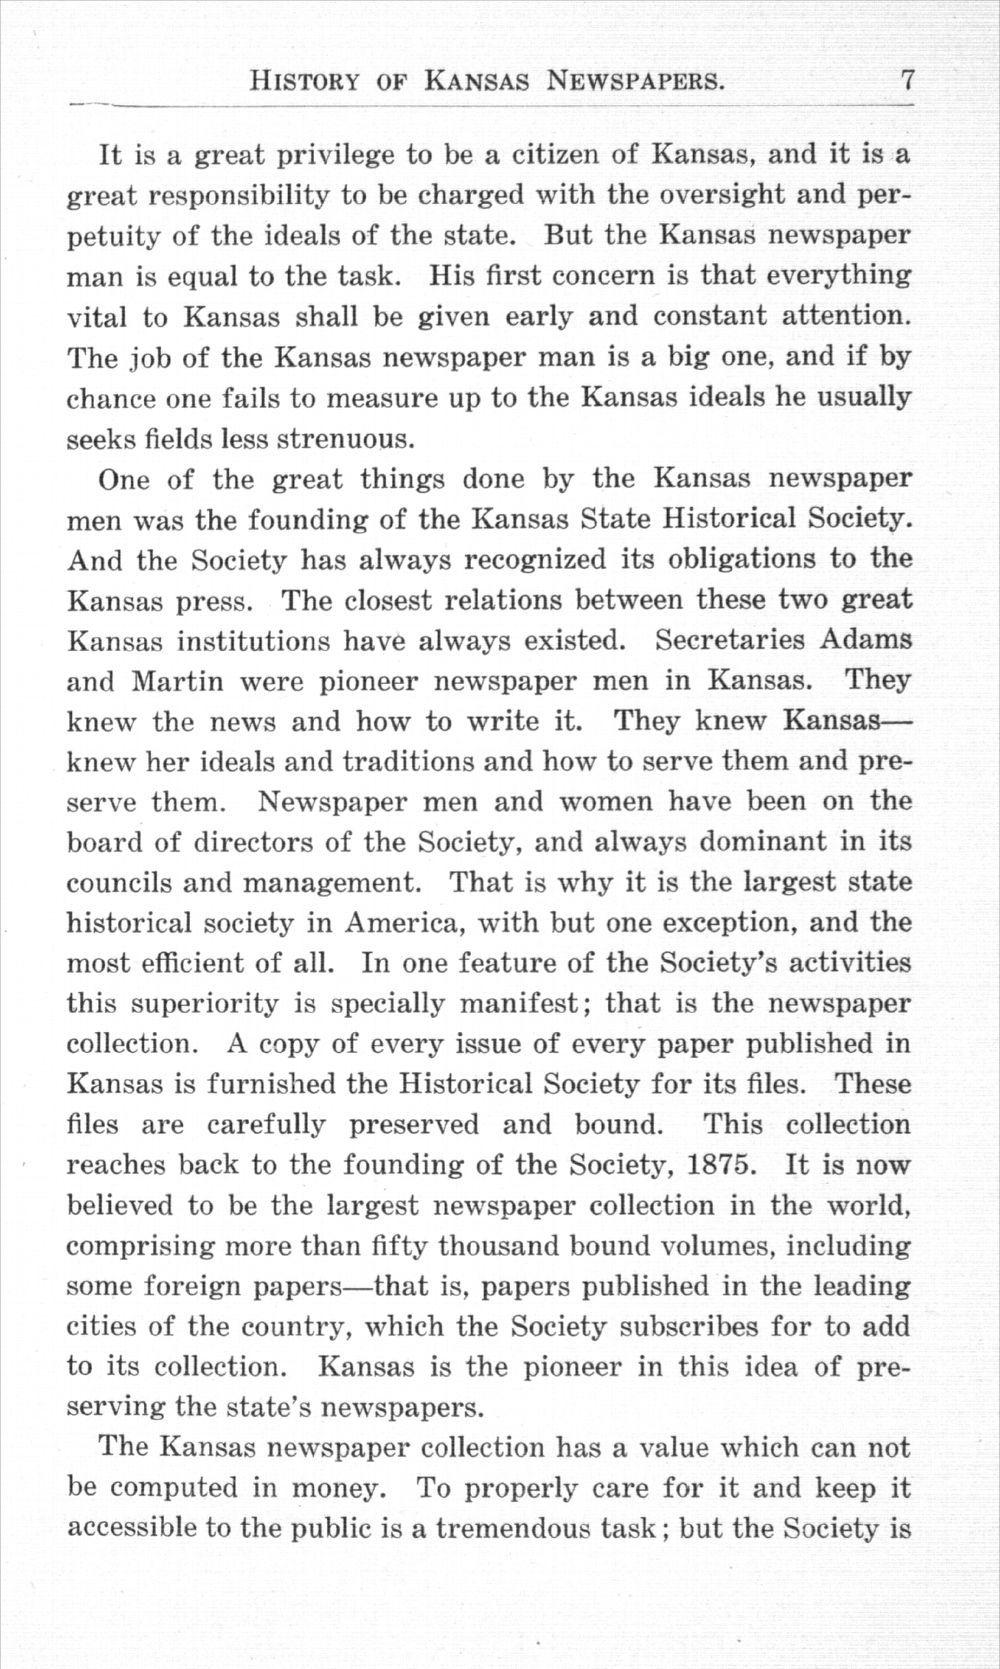 History of Kansas newspapers - 7